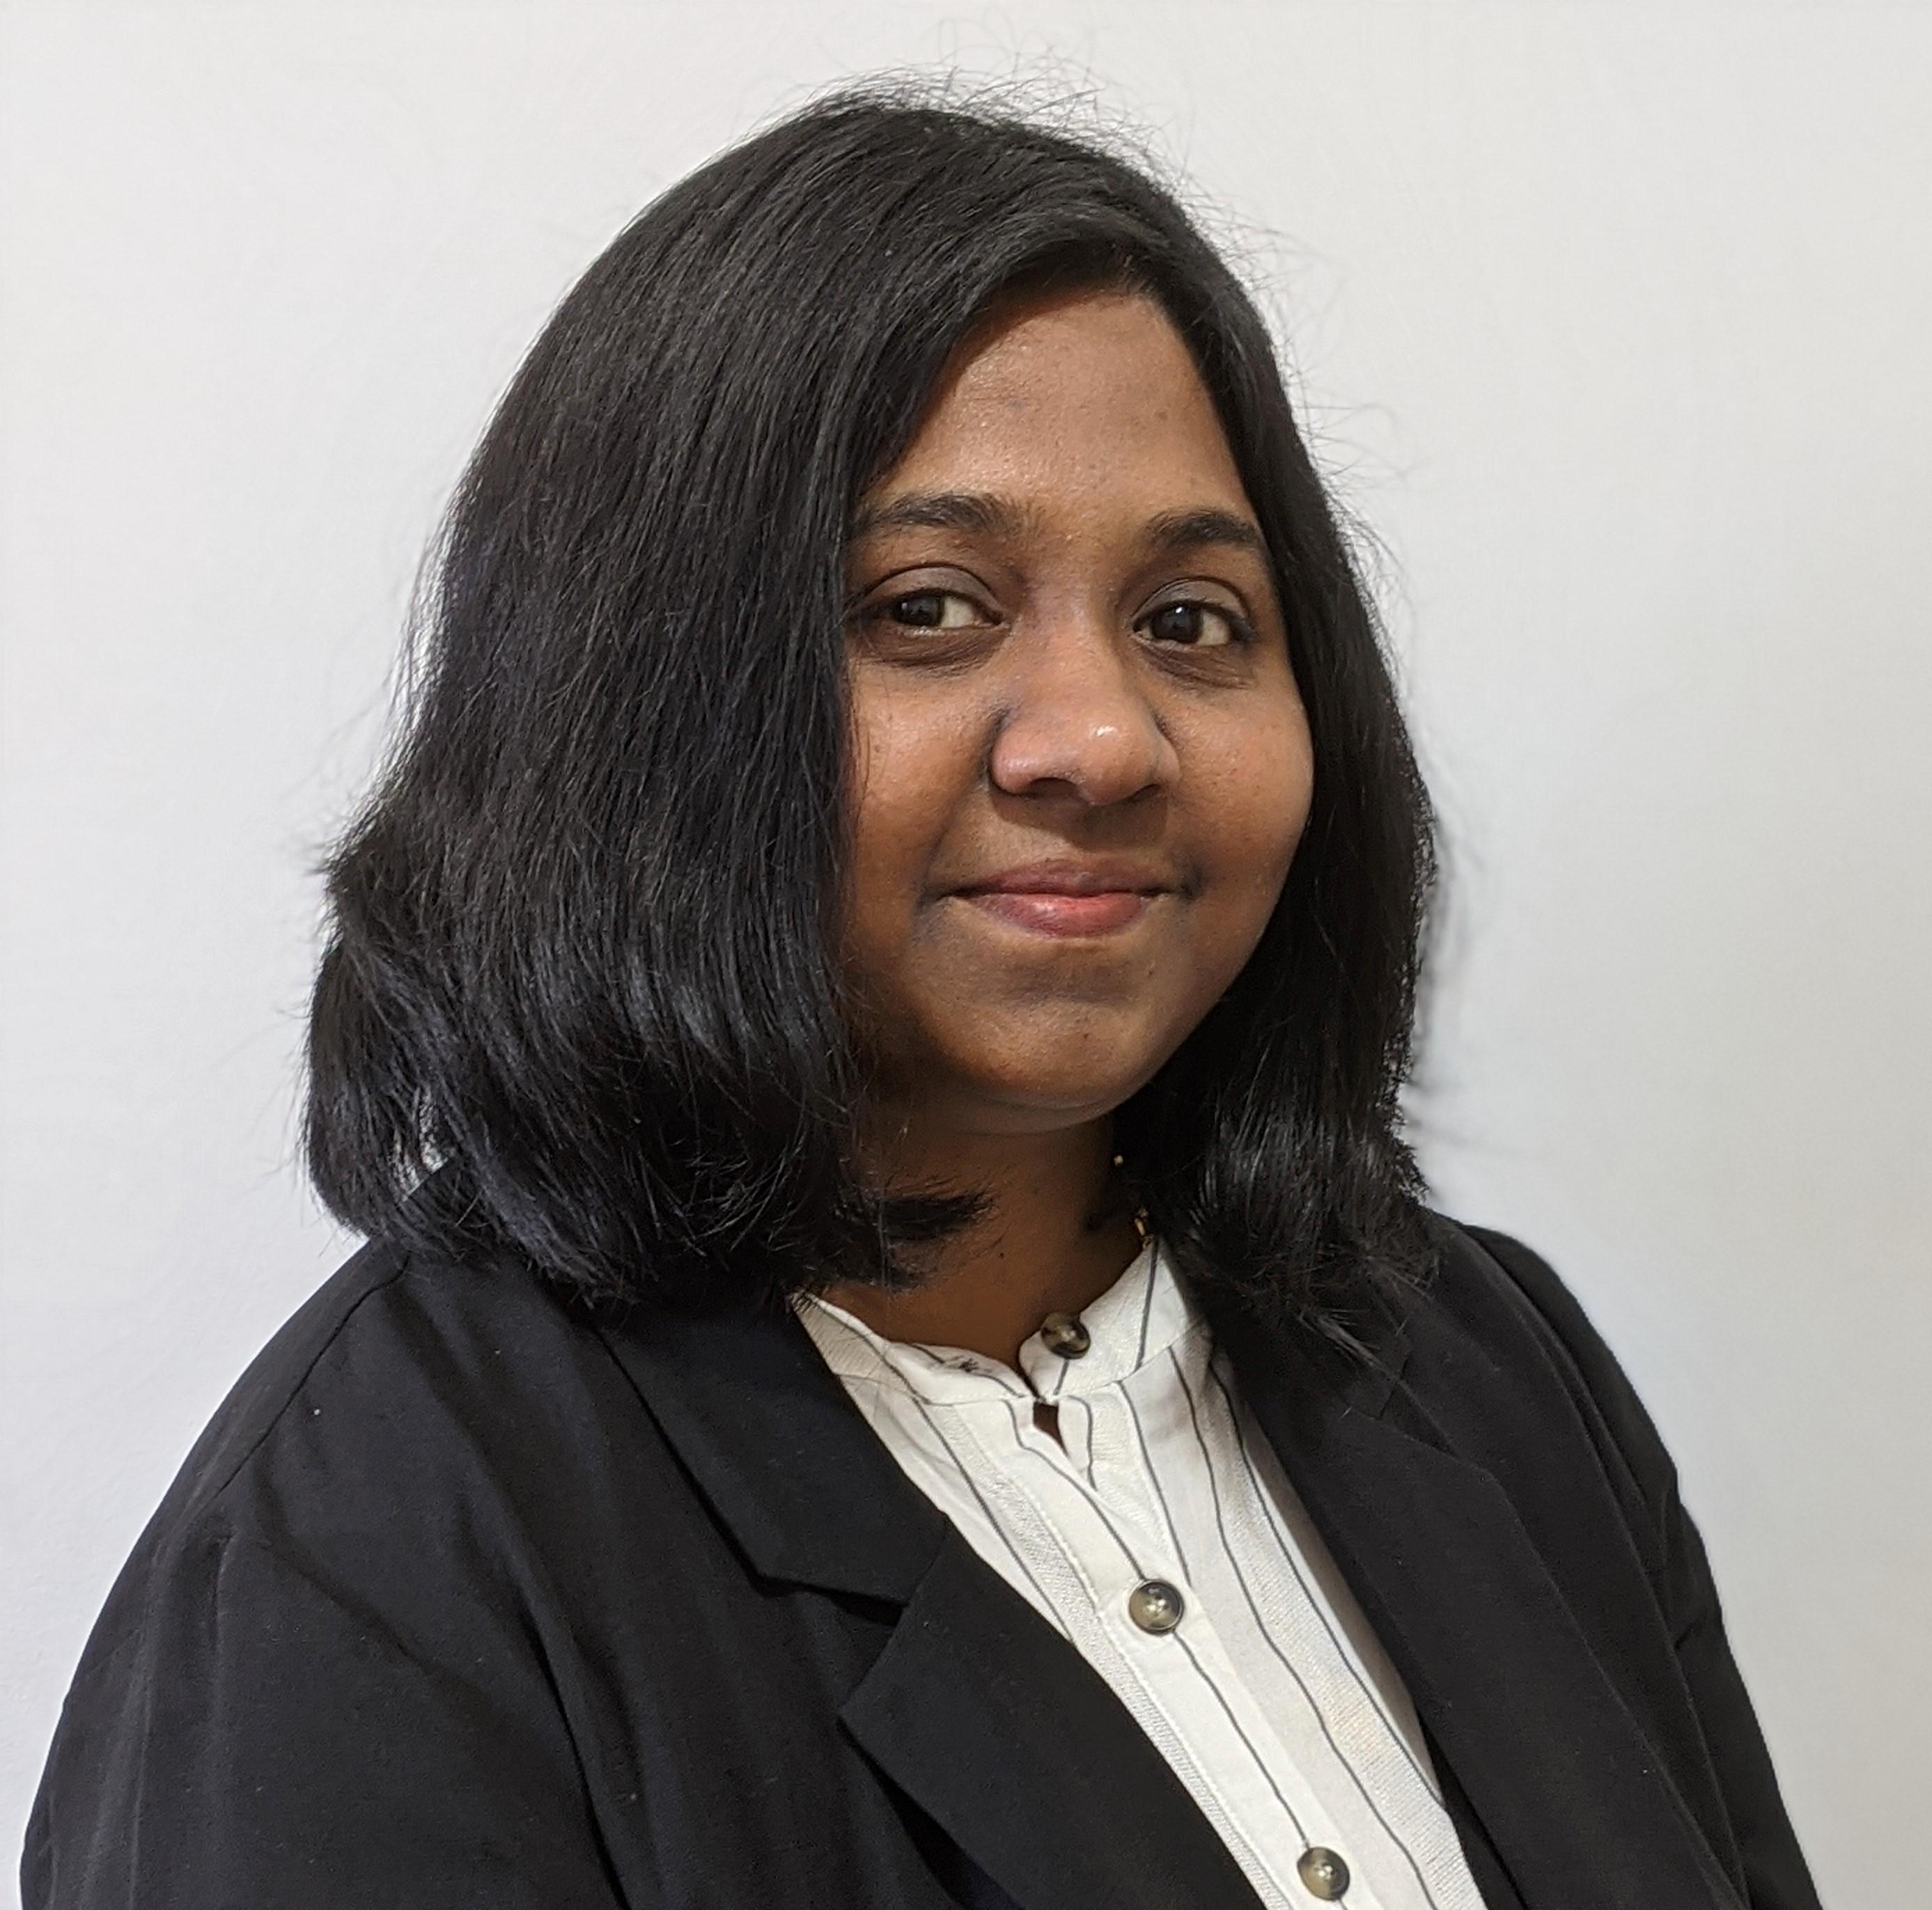 Dr Sheela Evangeline Kumaran